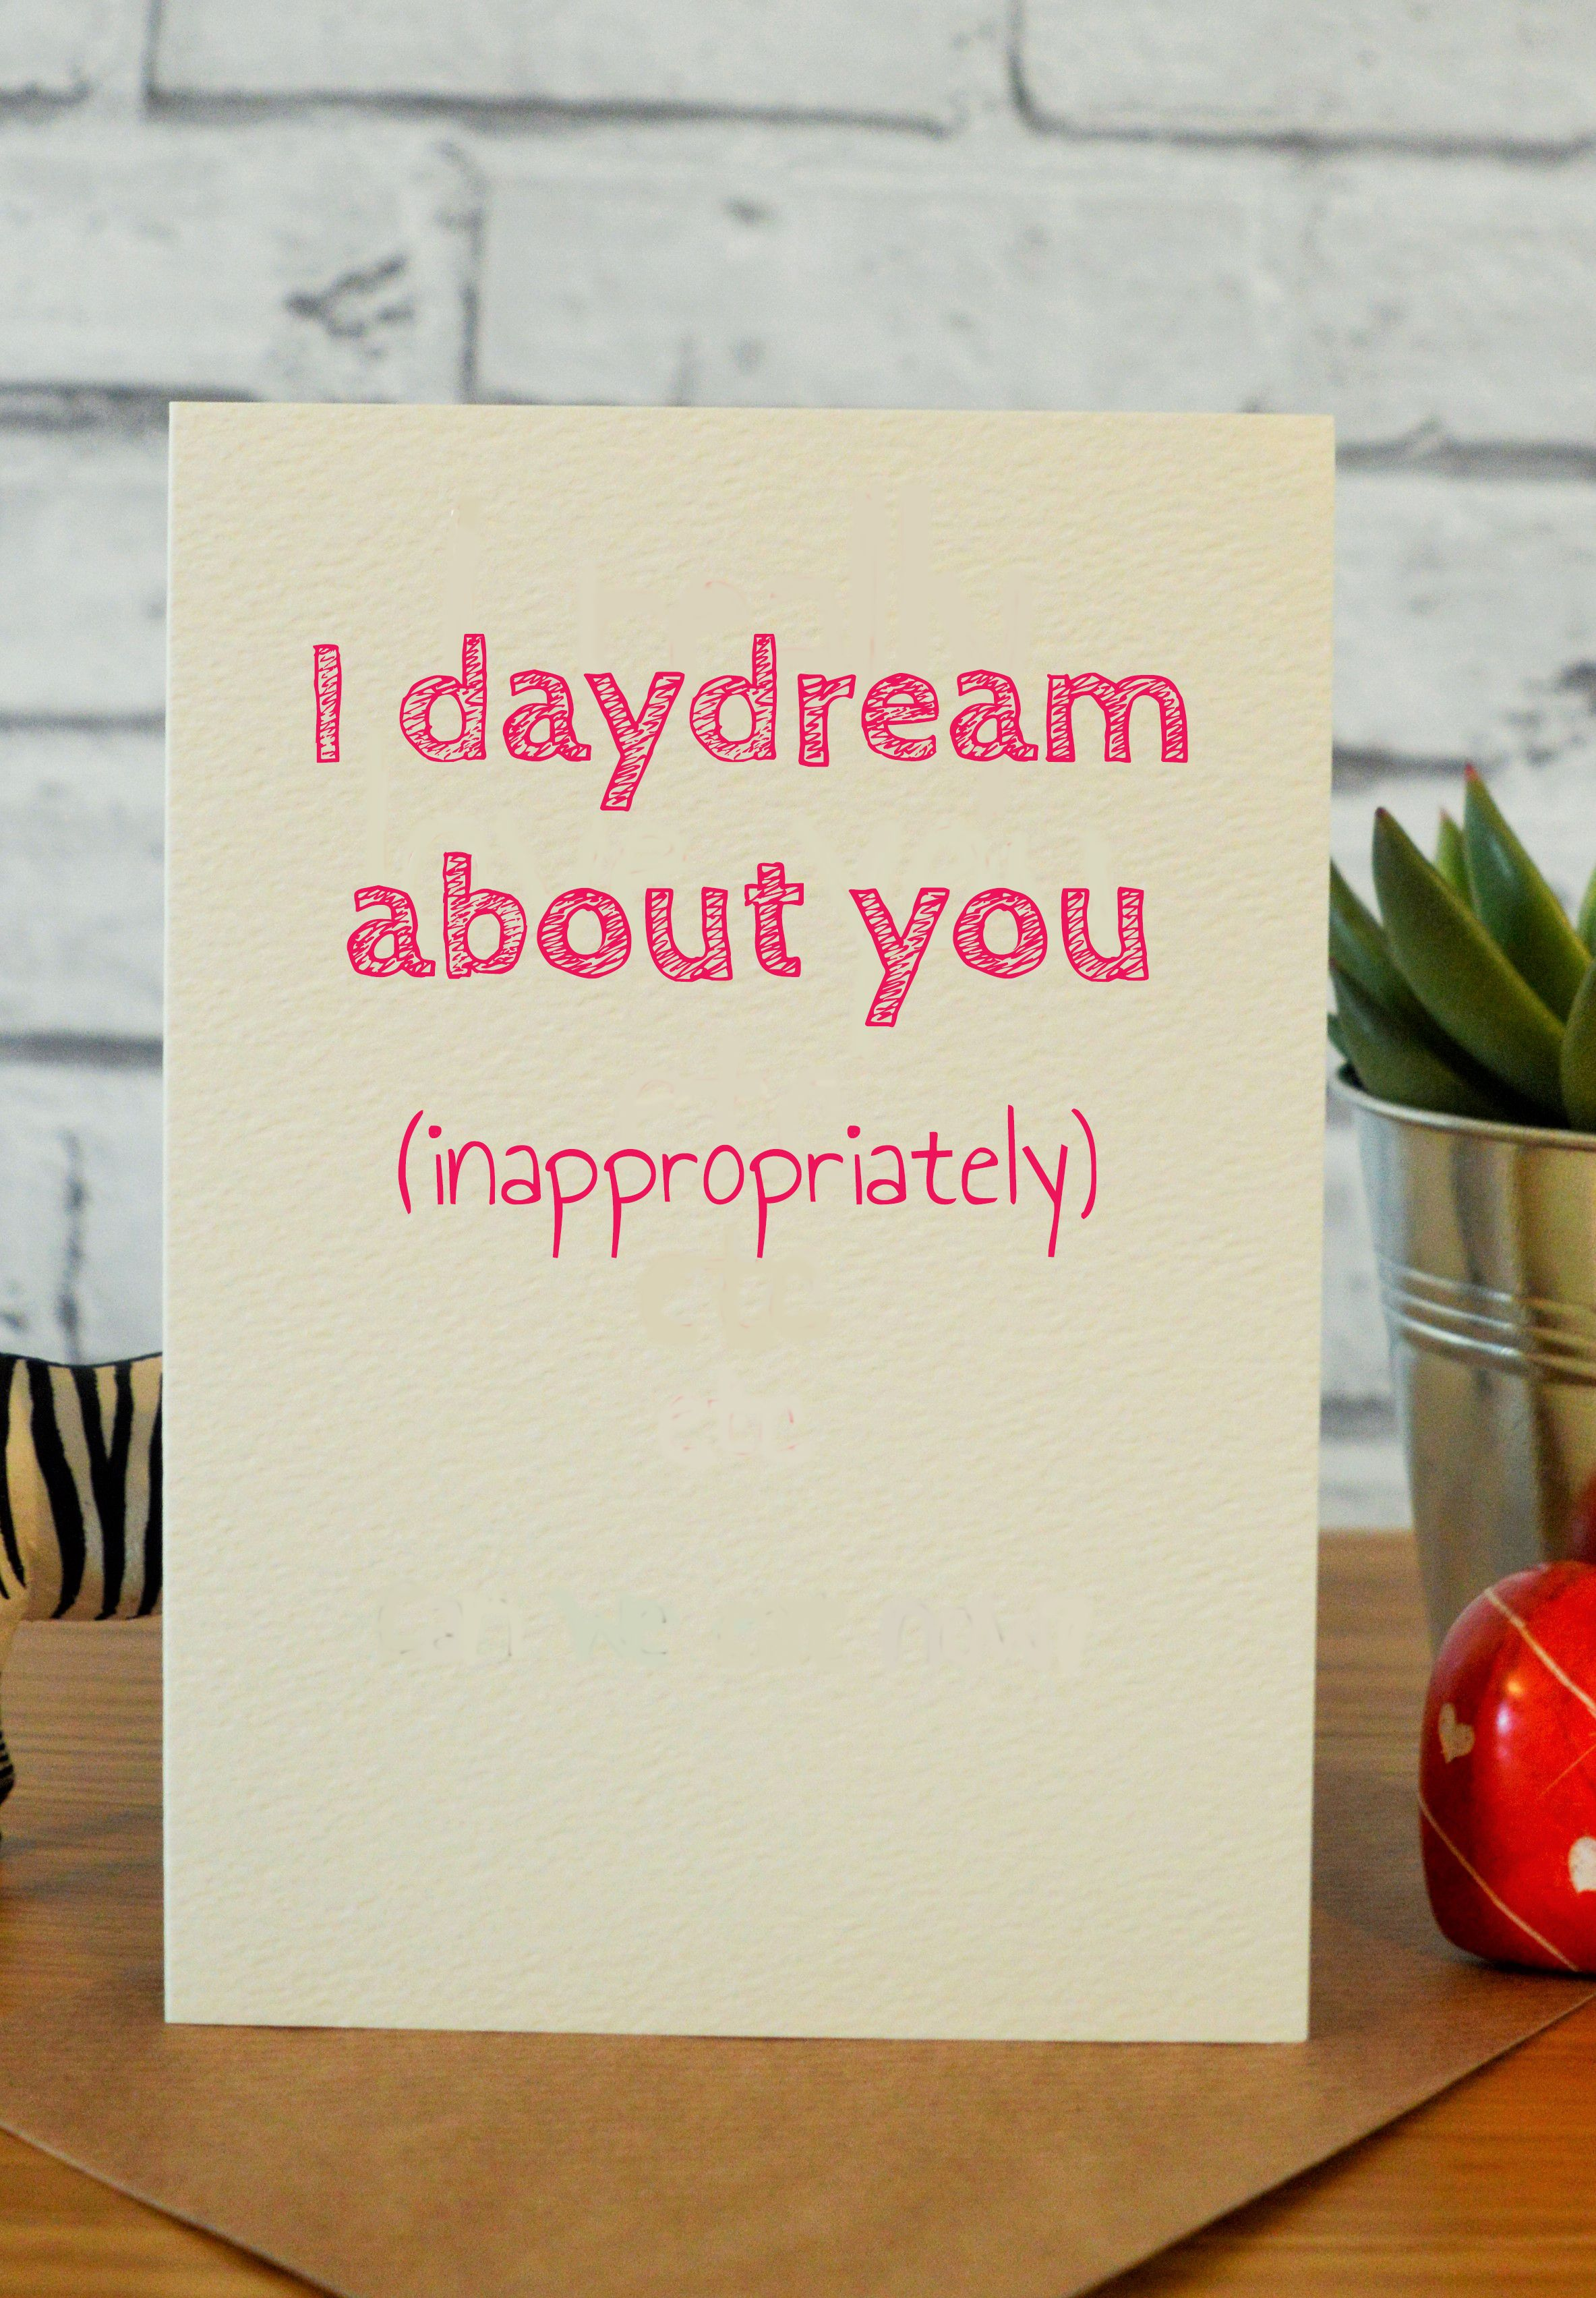 Funny anniversary cards, funny valentines day cards, valentines gifts, gifts for him, gifts for her, naughty valentines day card, sexy valentines day gift ideas, rude valentines day card, hilarious anniversary cards, etsy, handmade valentines day card, ha https://www.youtube.com/watch?v=Jw4hoIYmDiM